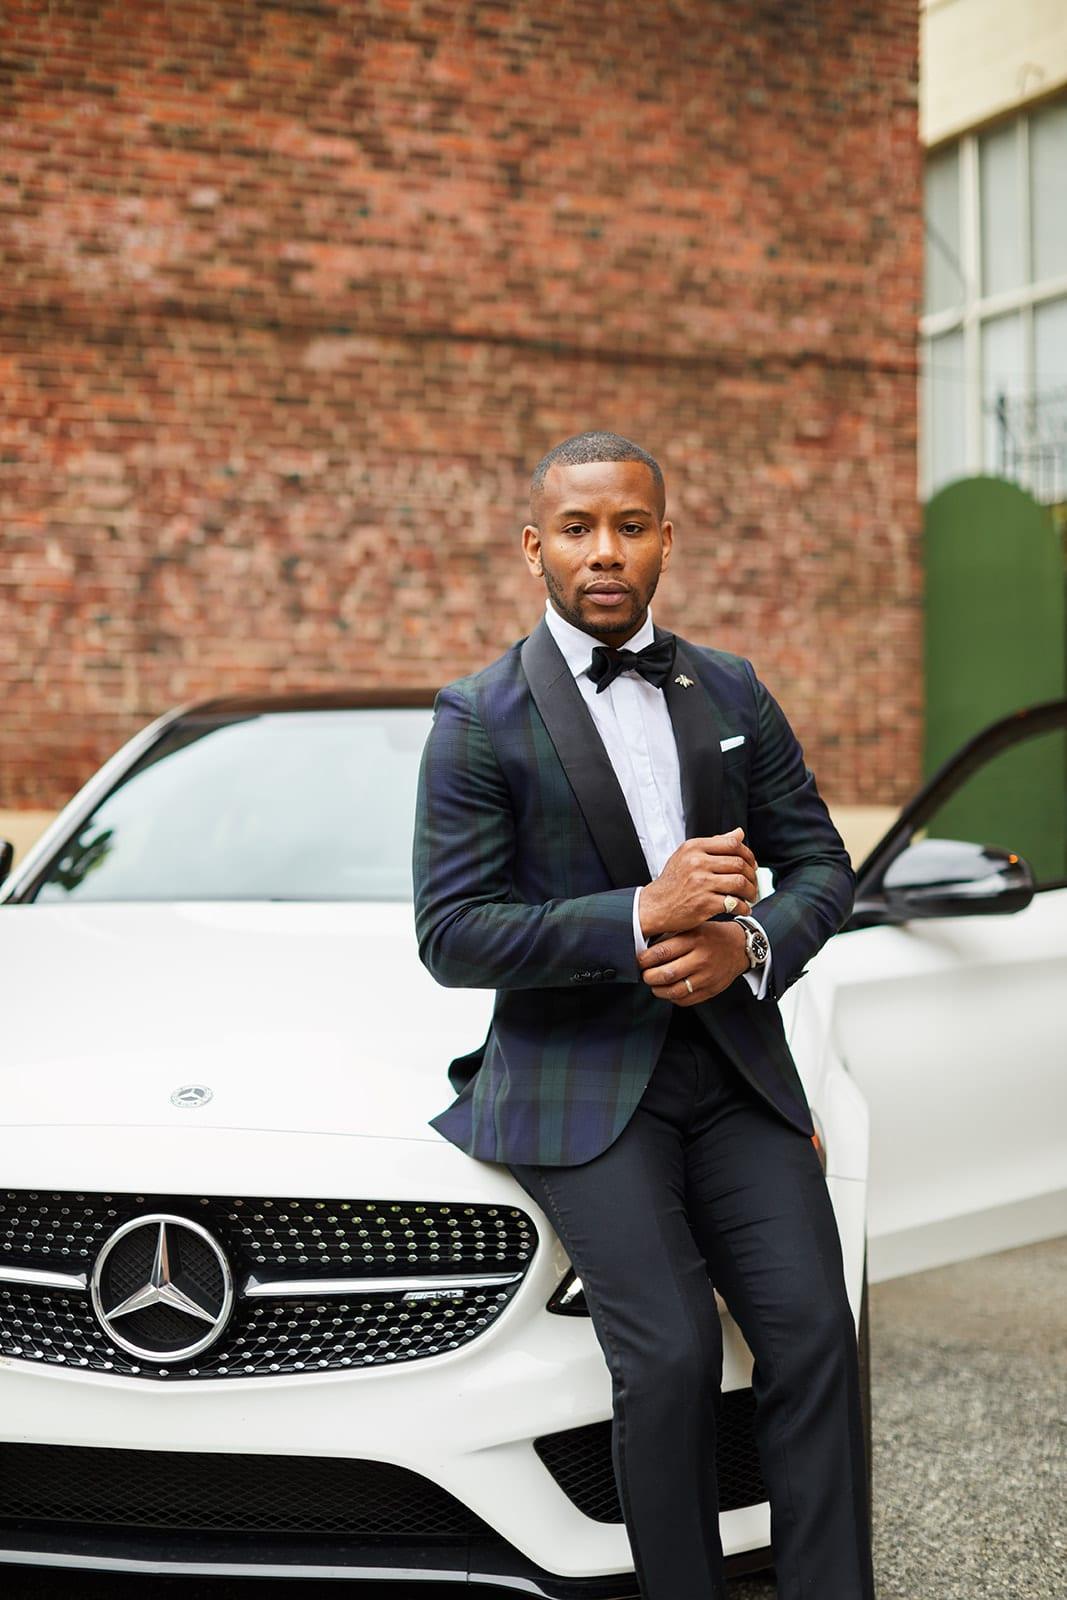 Sabir M. Peele of Men's Style Pro Review Mercedes Benz Collection